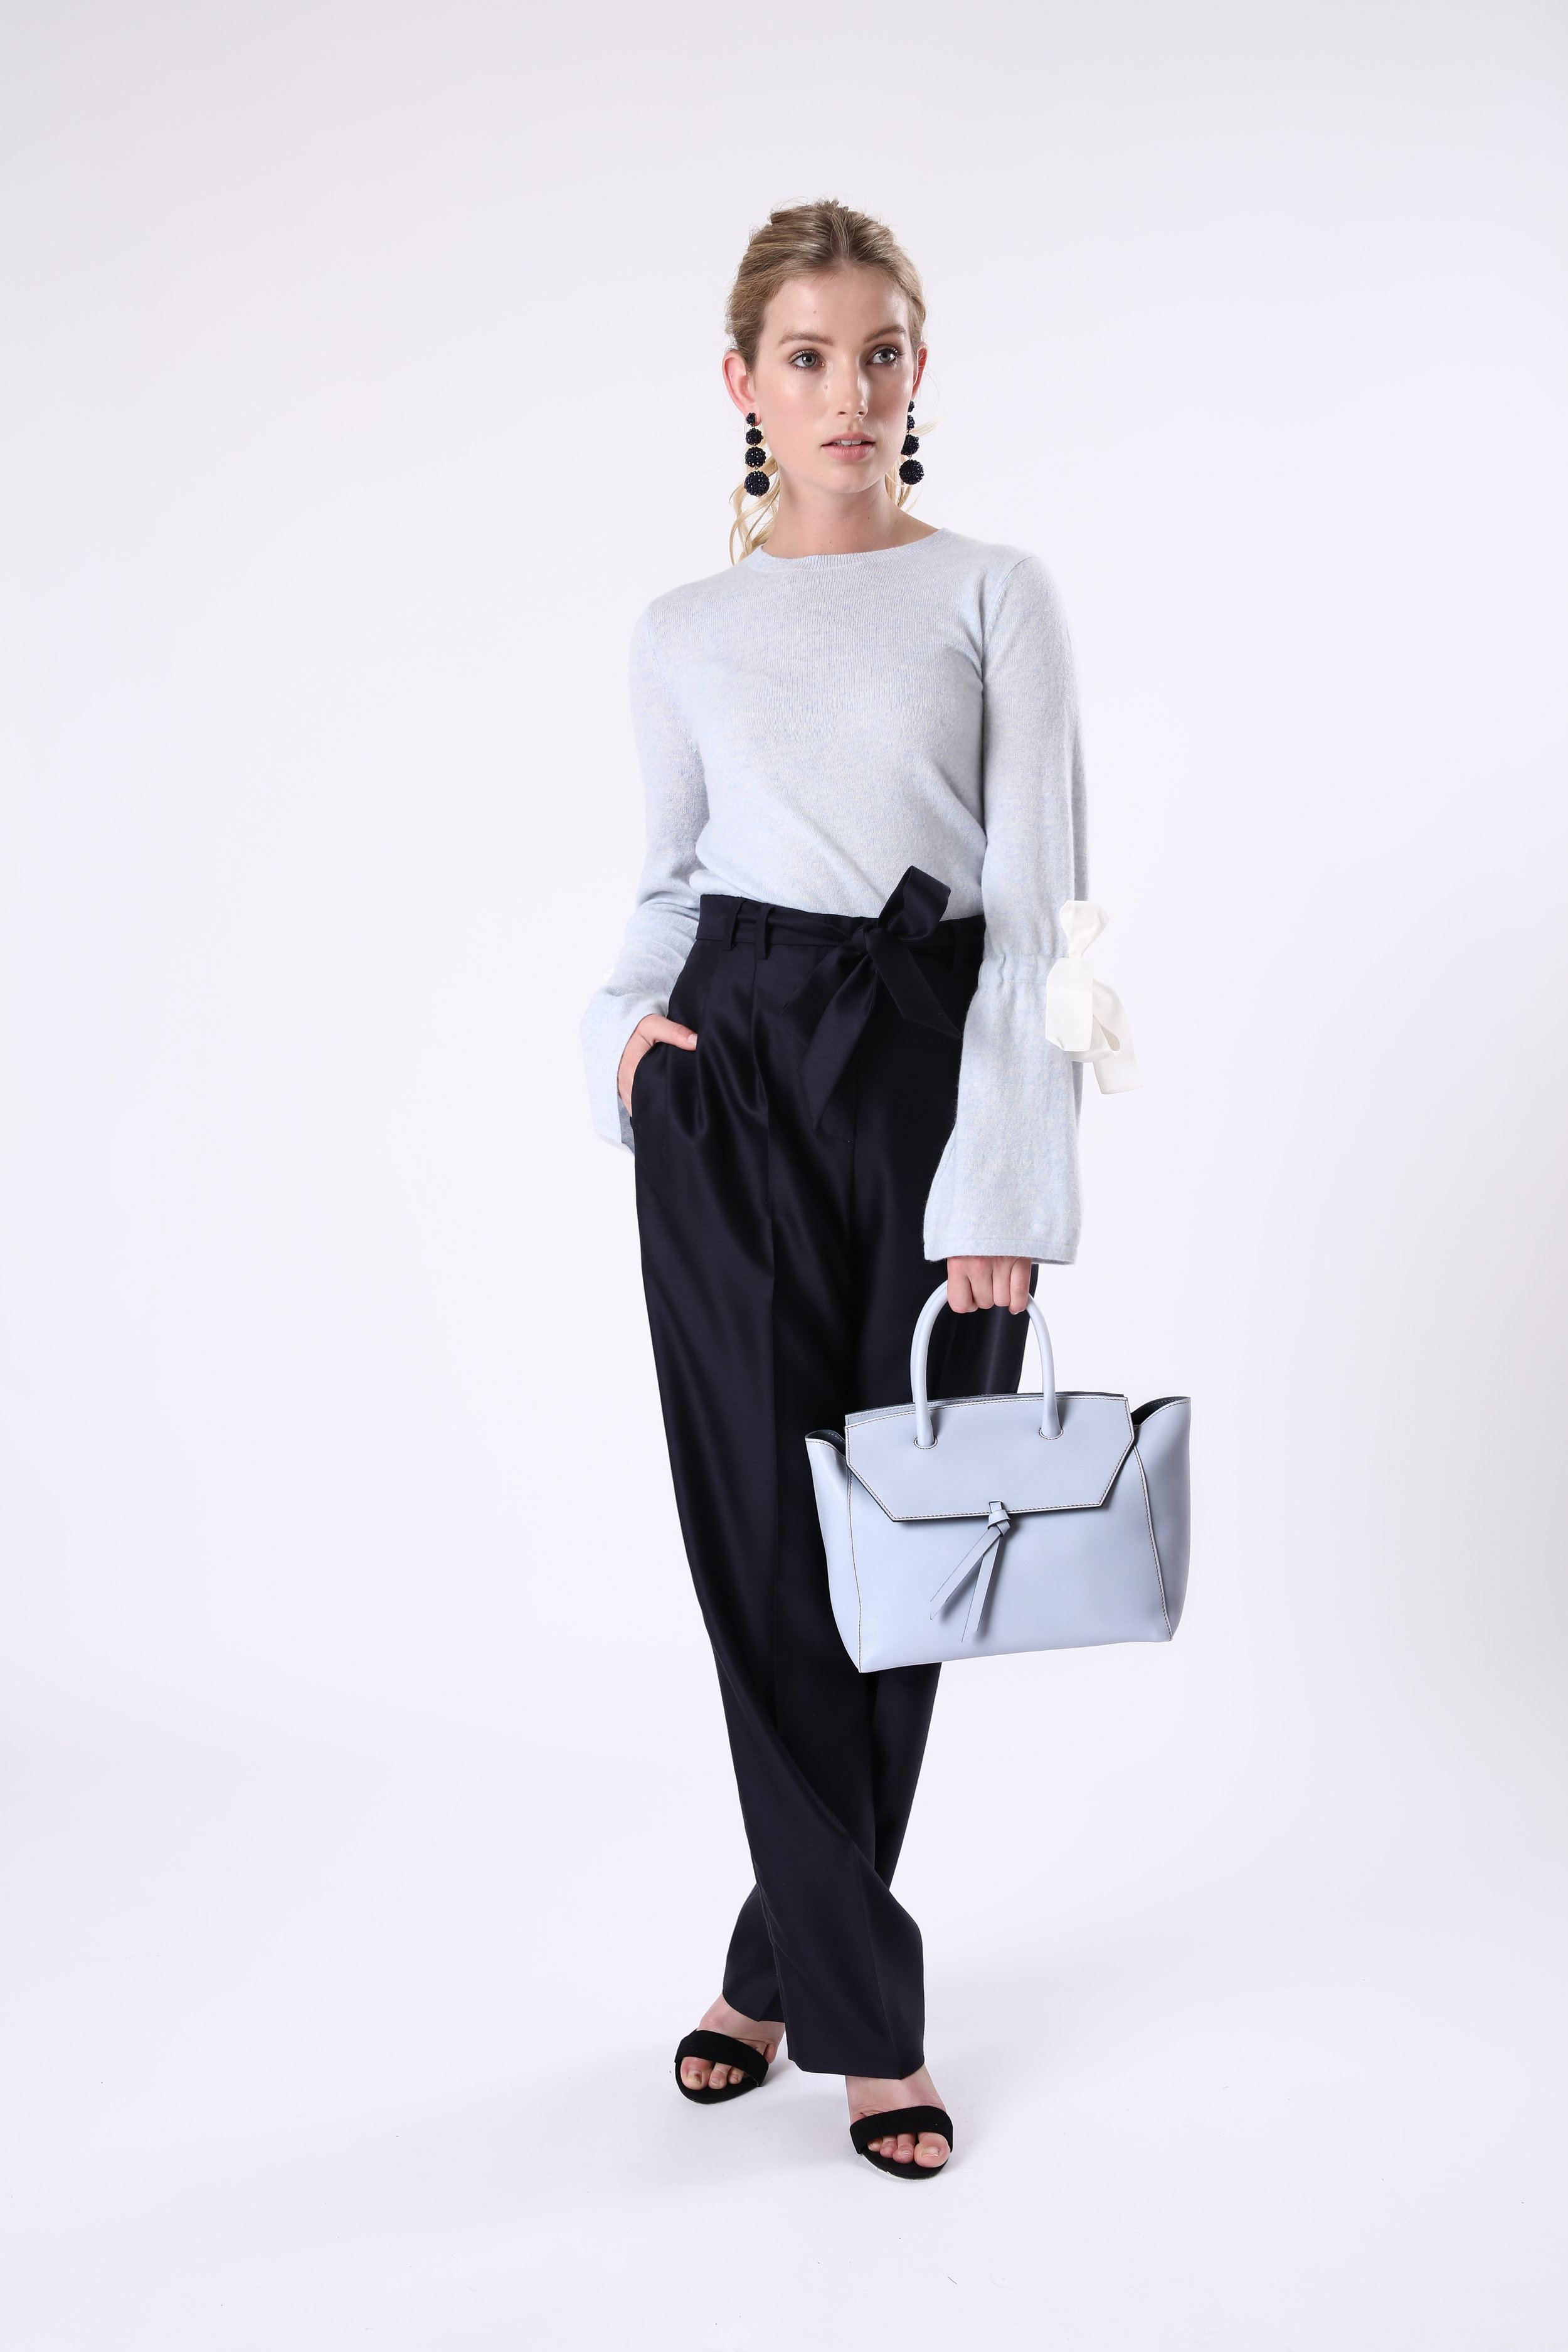 Alexandra de Curtis Sky Blue Midi Loren Tote Leather Handbag work tote